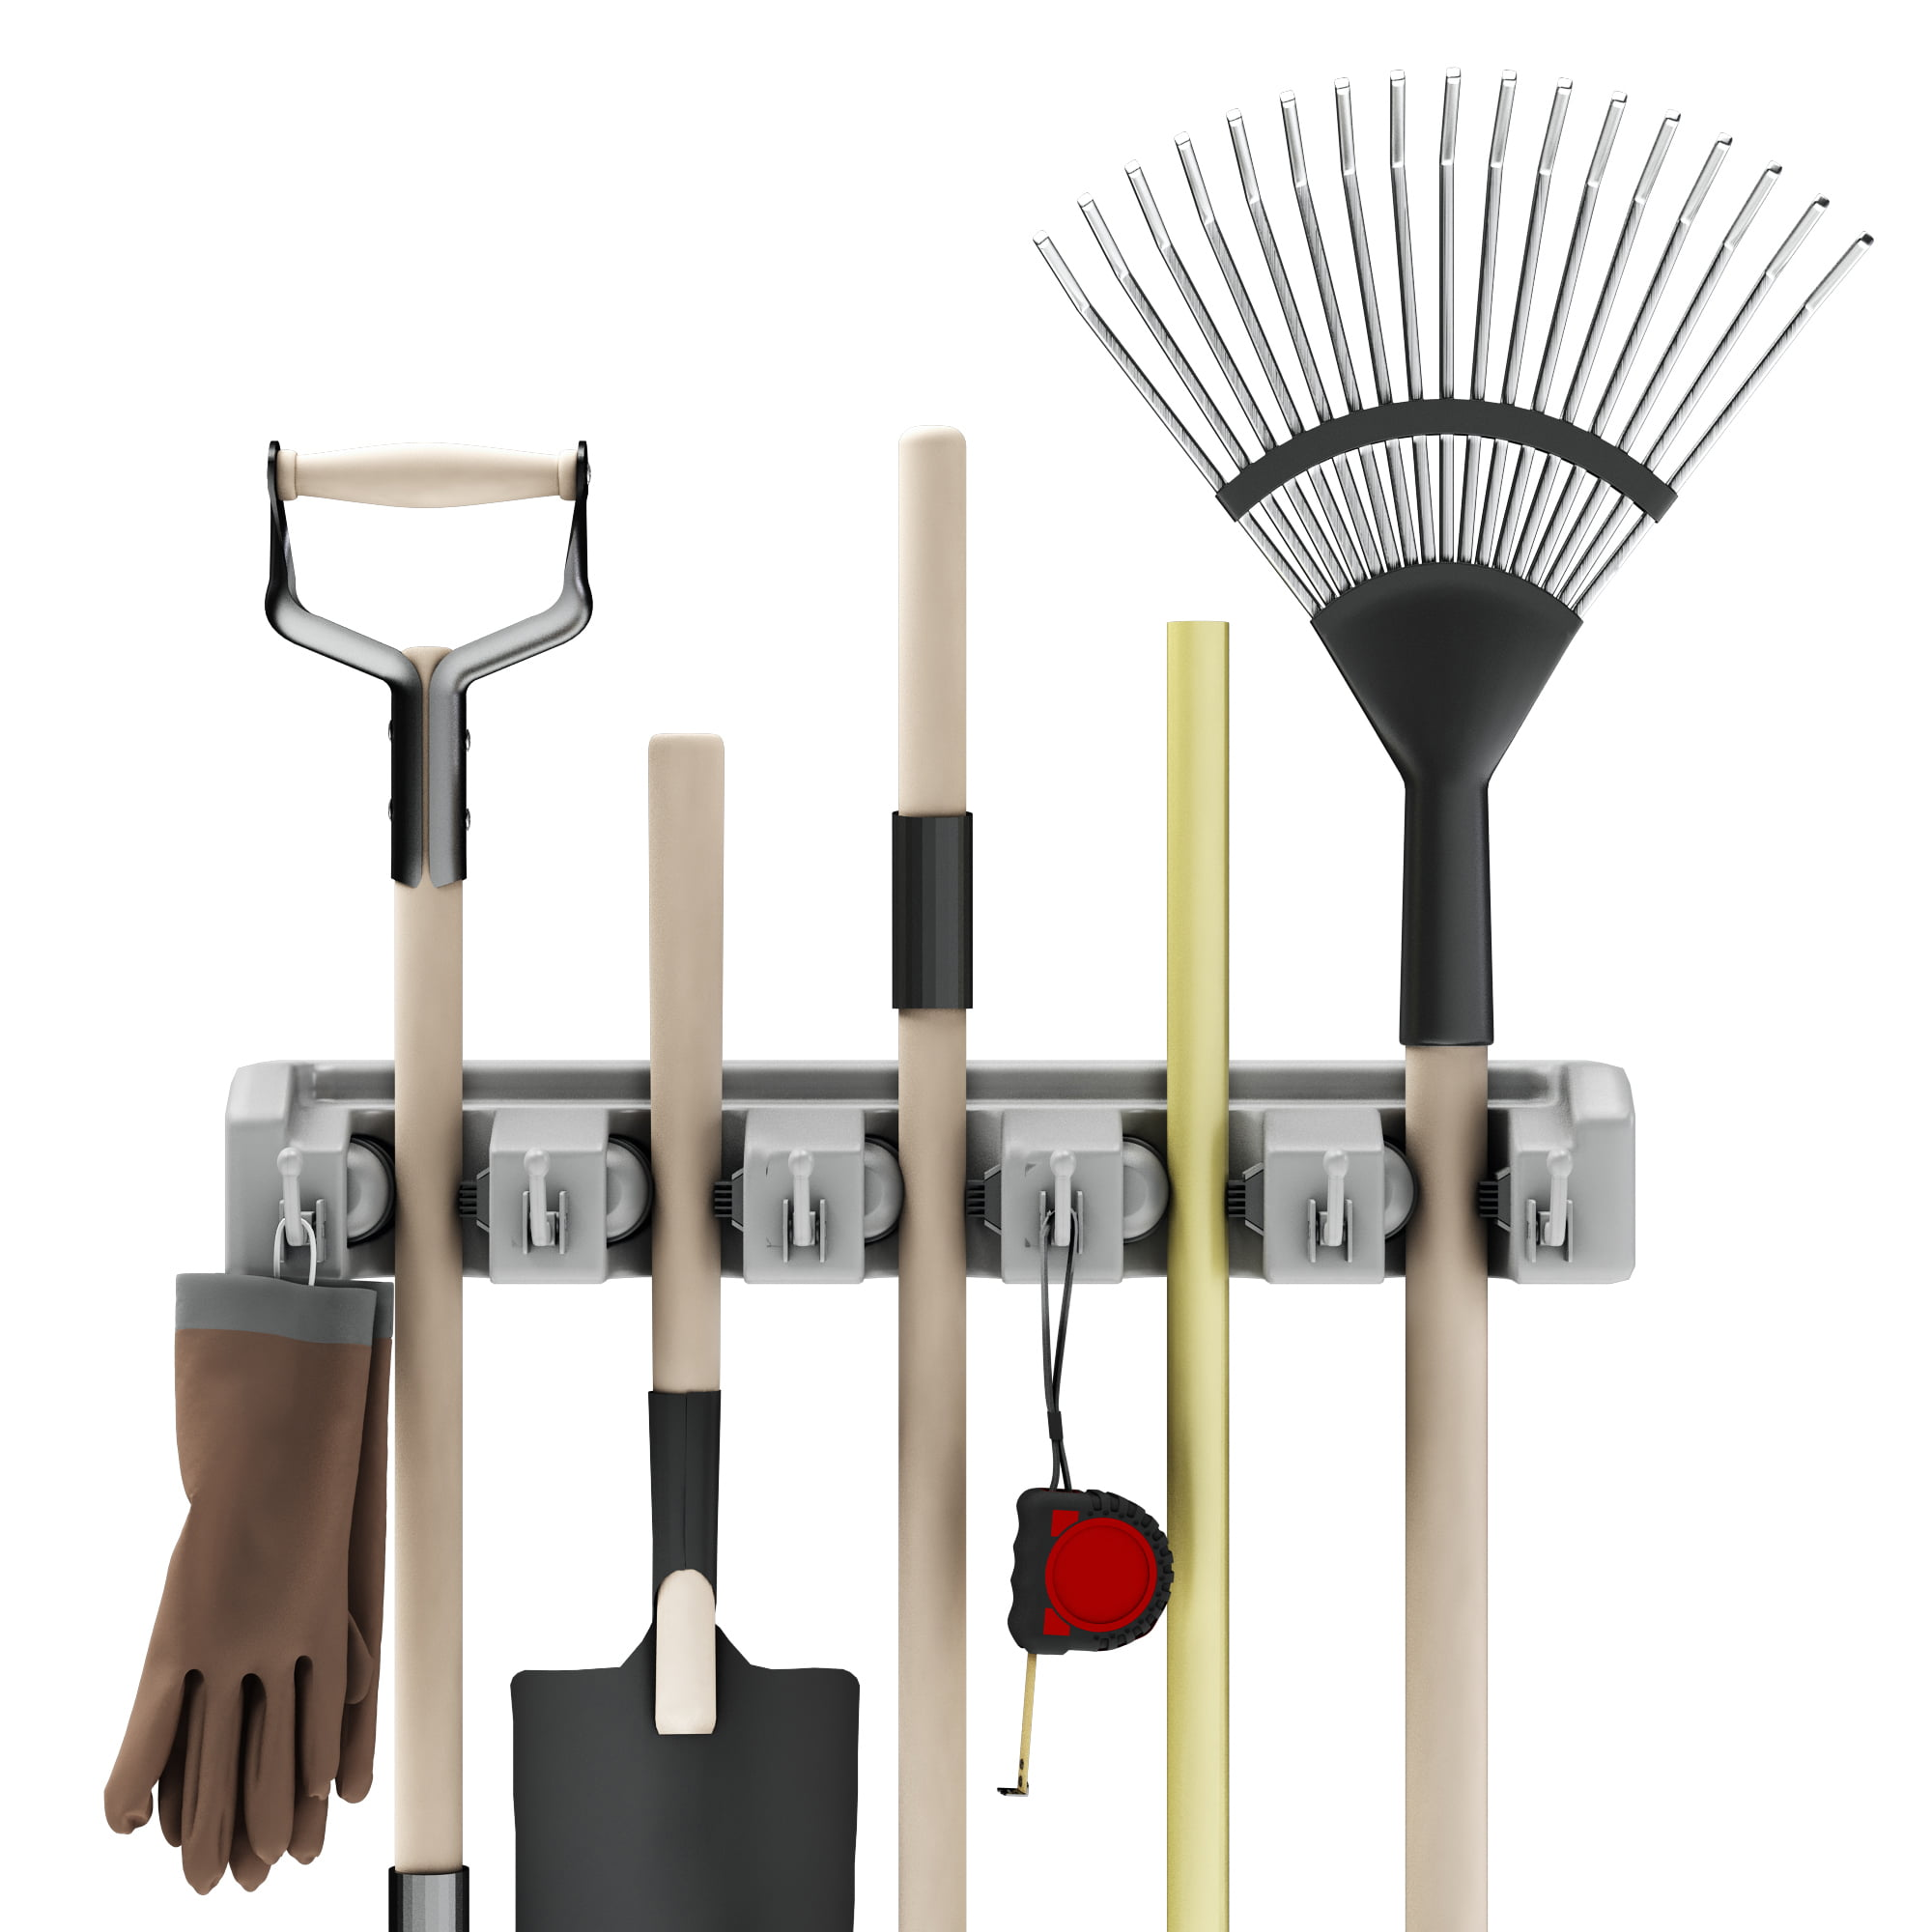 Shovel Rake And Tool Holder With Hooks Wall Mounted Organizer